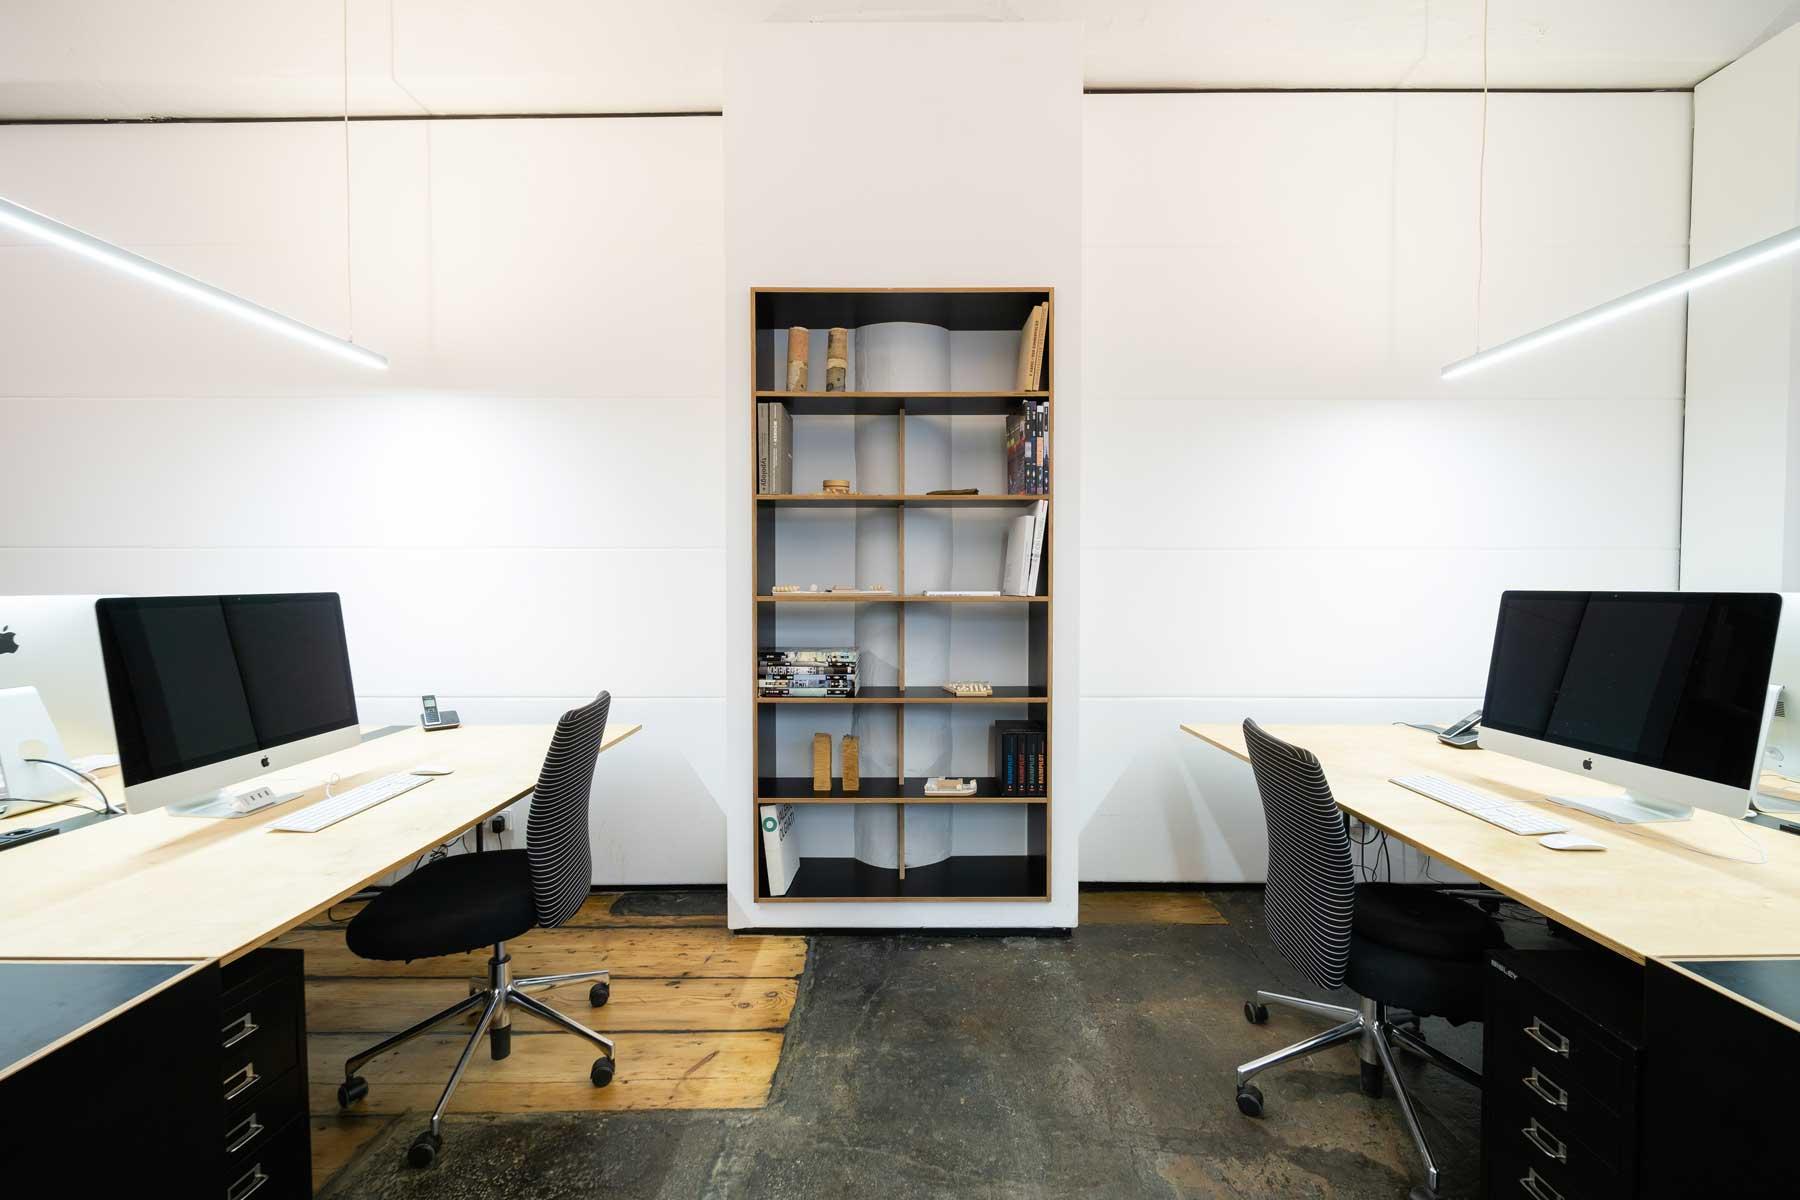 STUDIOKUBIK-KUBIK-architektur-architecture-berlin-umbau-buero-office_2